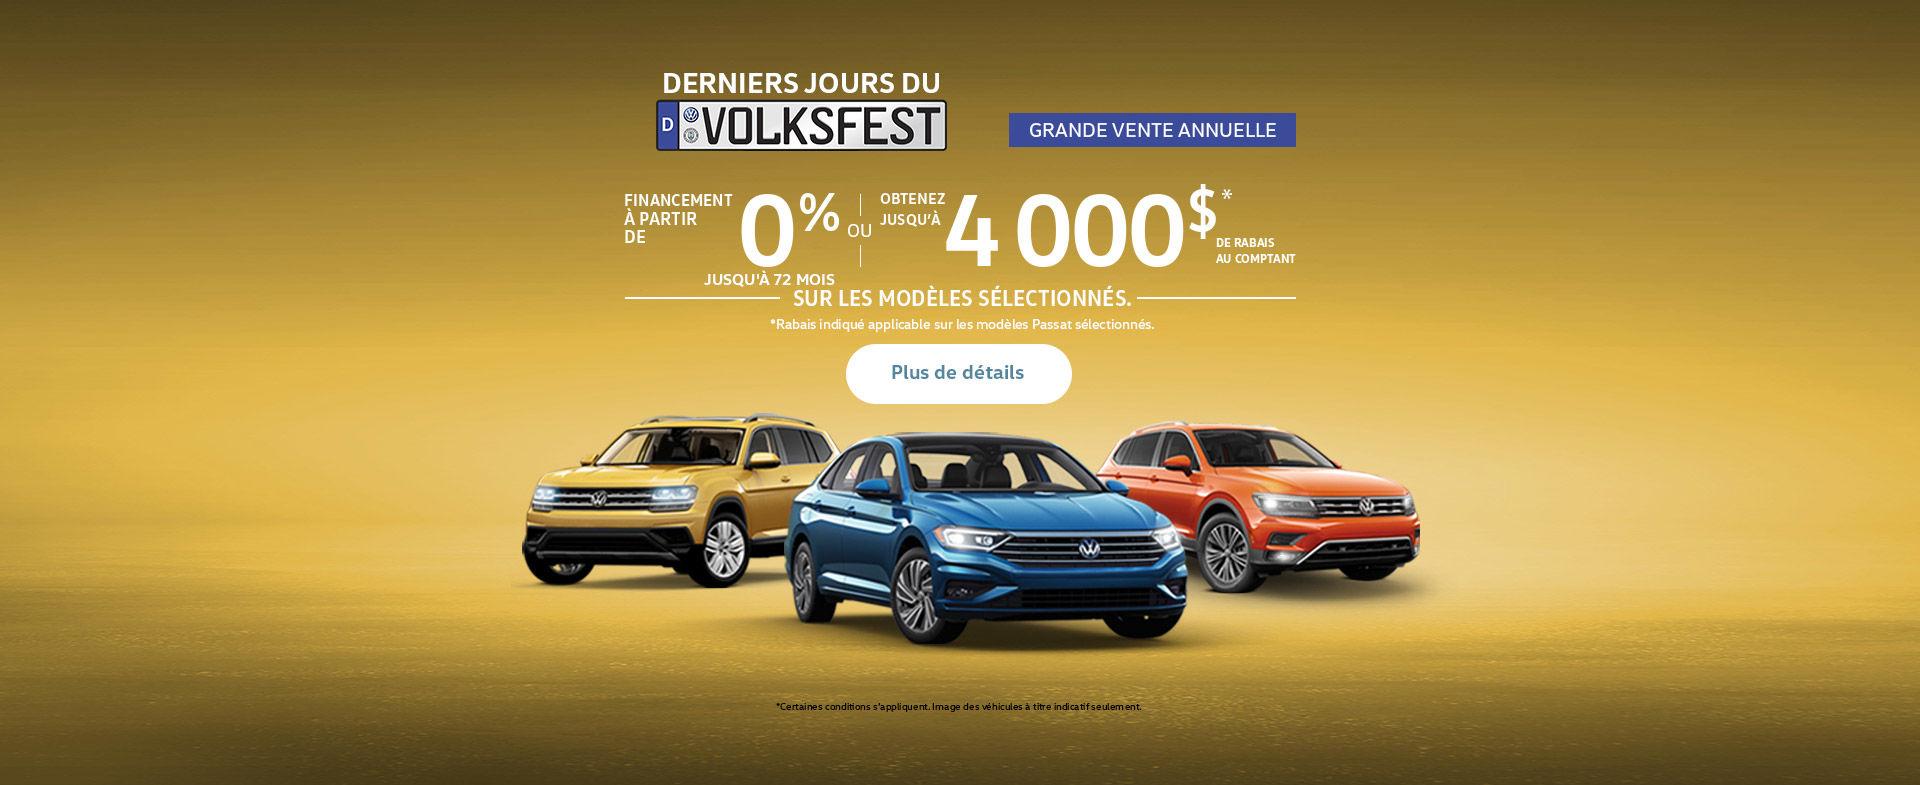 Événement Volkswagen (NS)